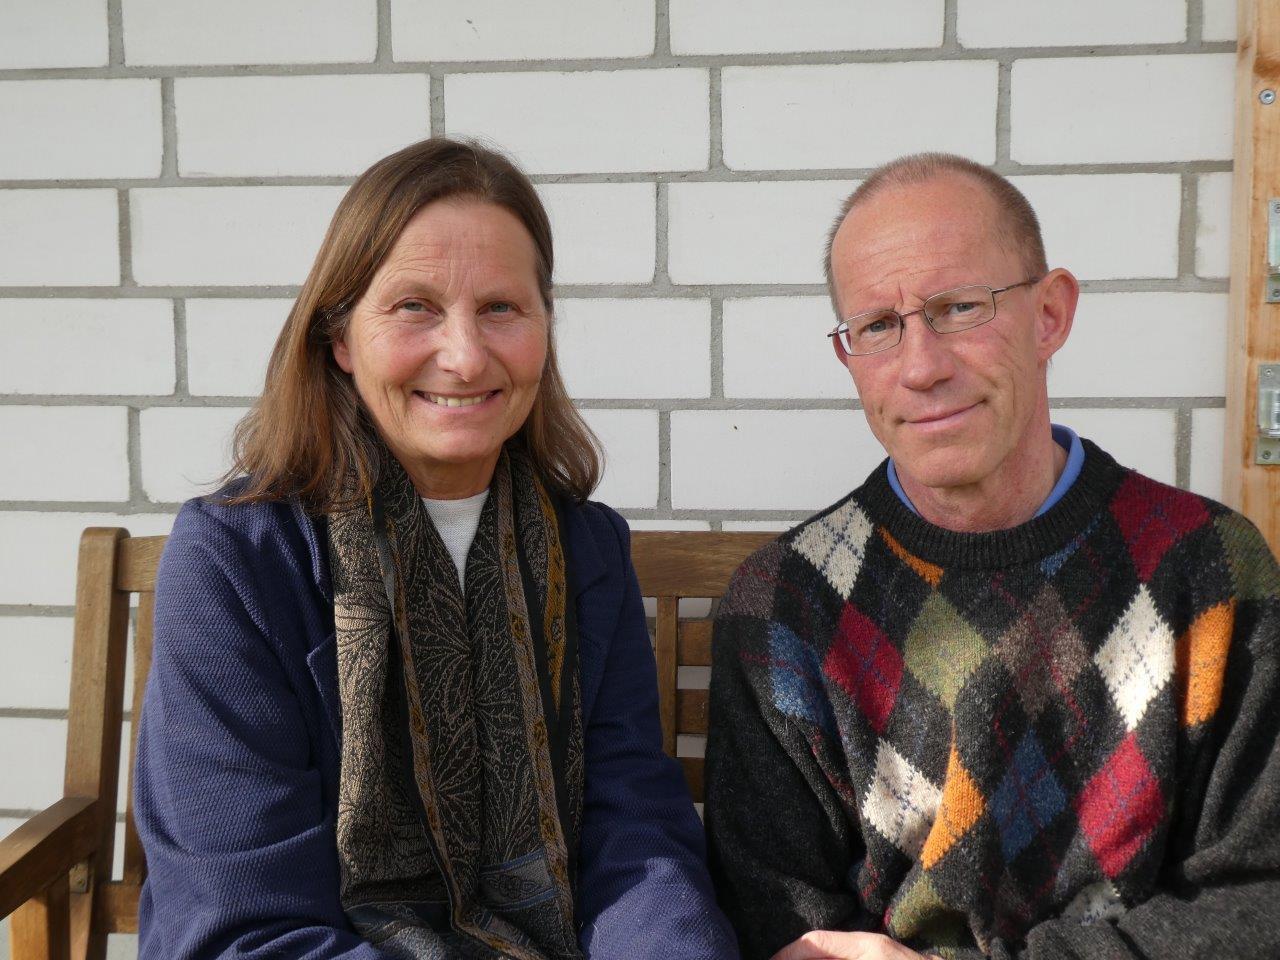 Astrid & Heinrich Reinke